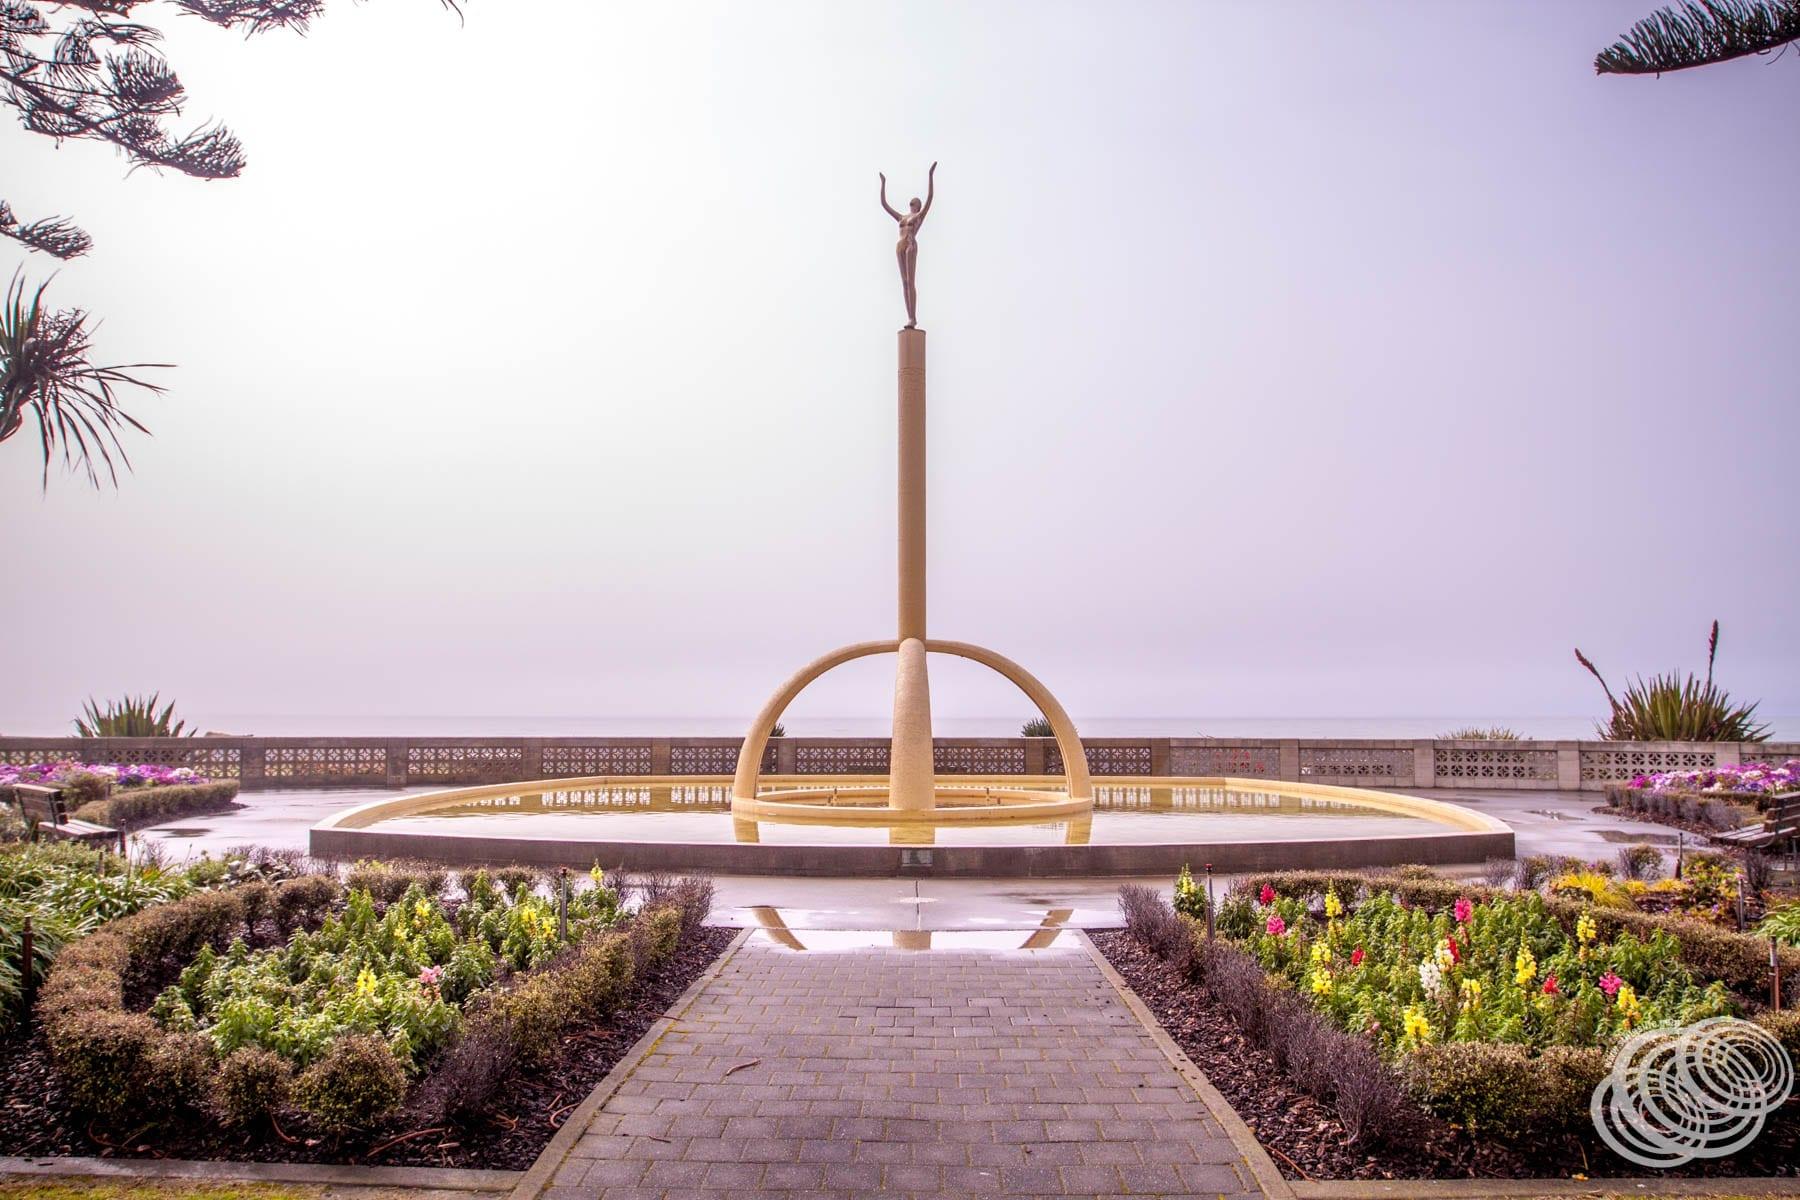 The Spirit of Napier Statue